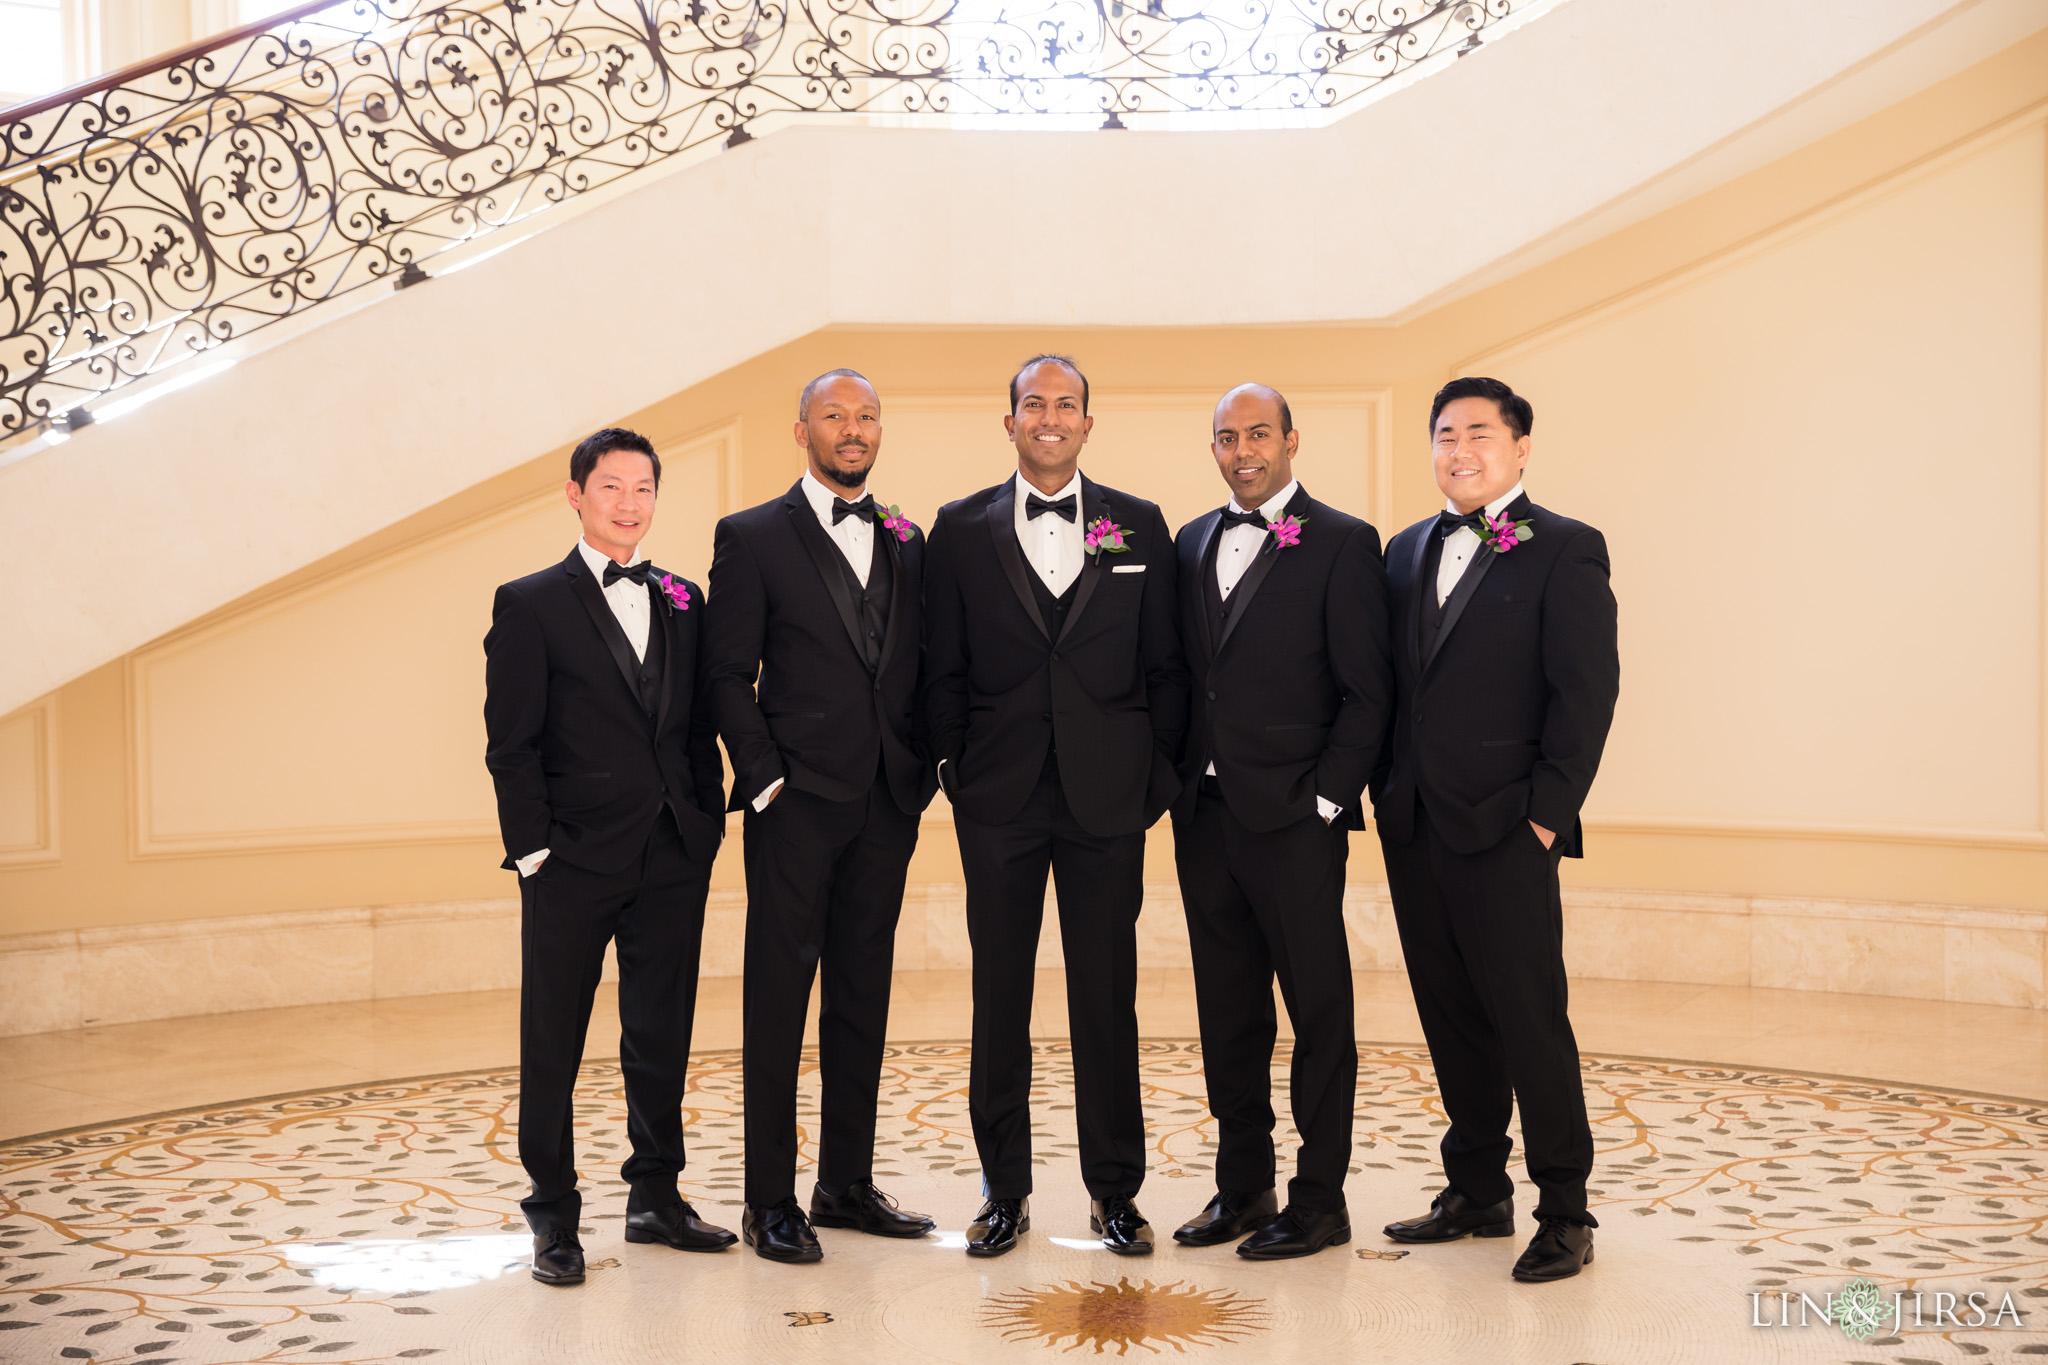 10 monarch beach resort groomsmen wedding photography